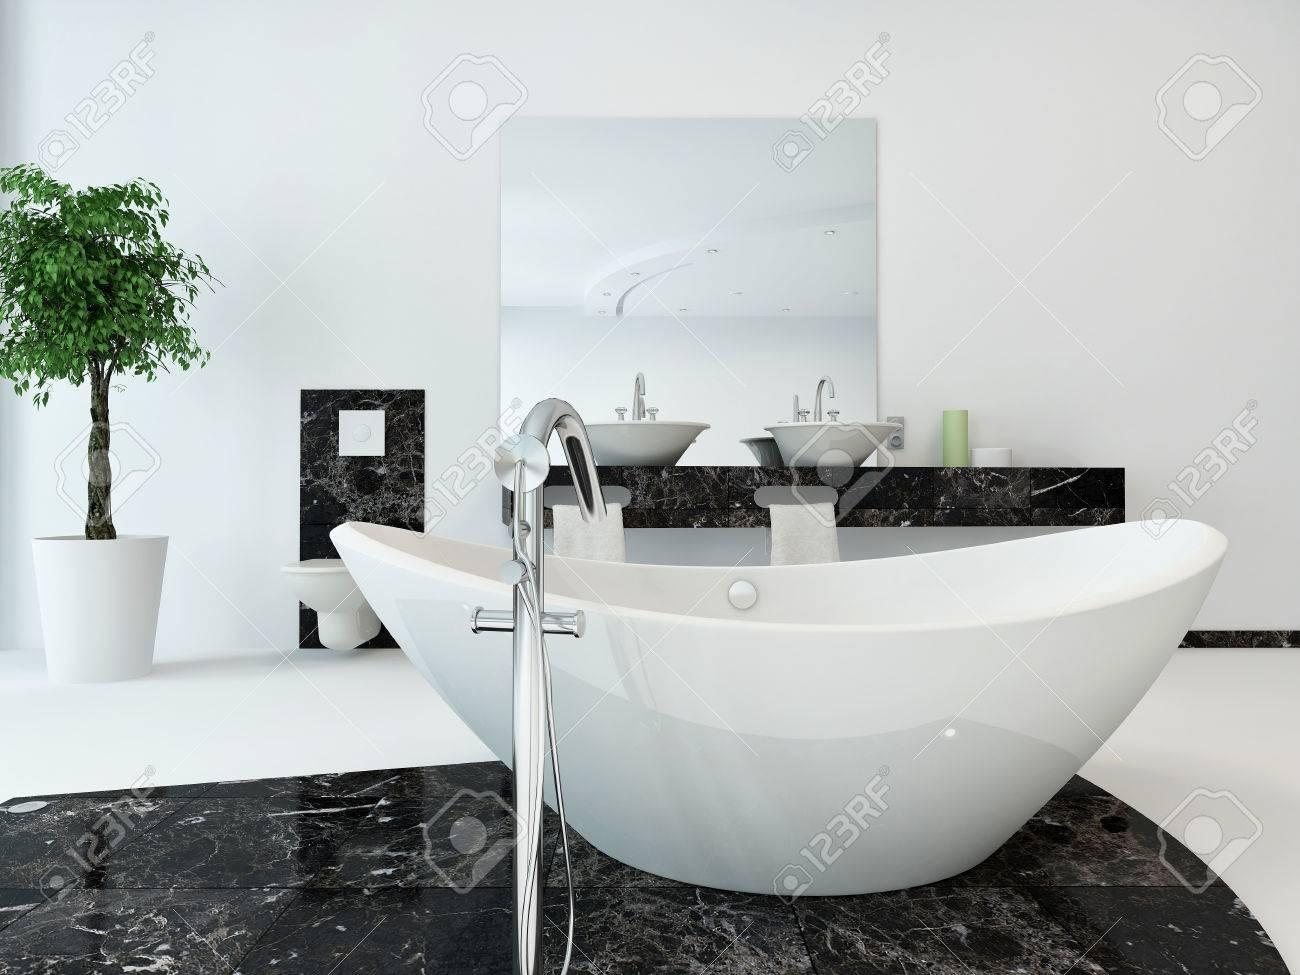 Luxury Bathroom Interior With Nice White Freestanding Bathtub Stock ...